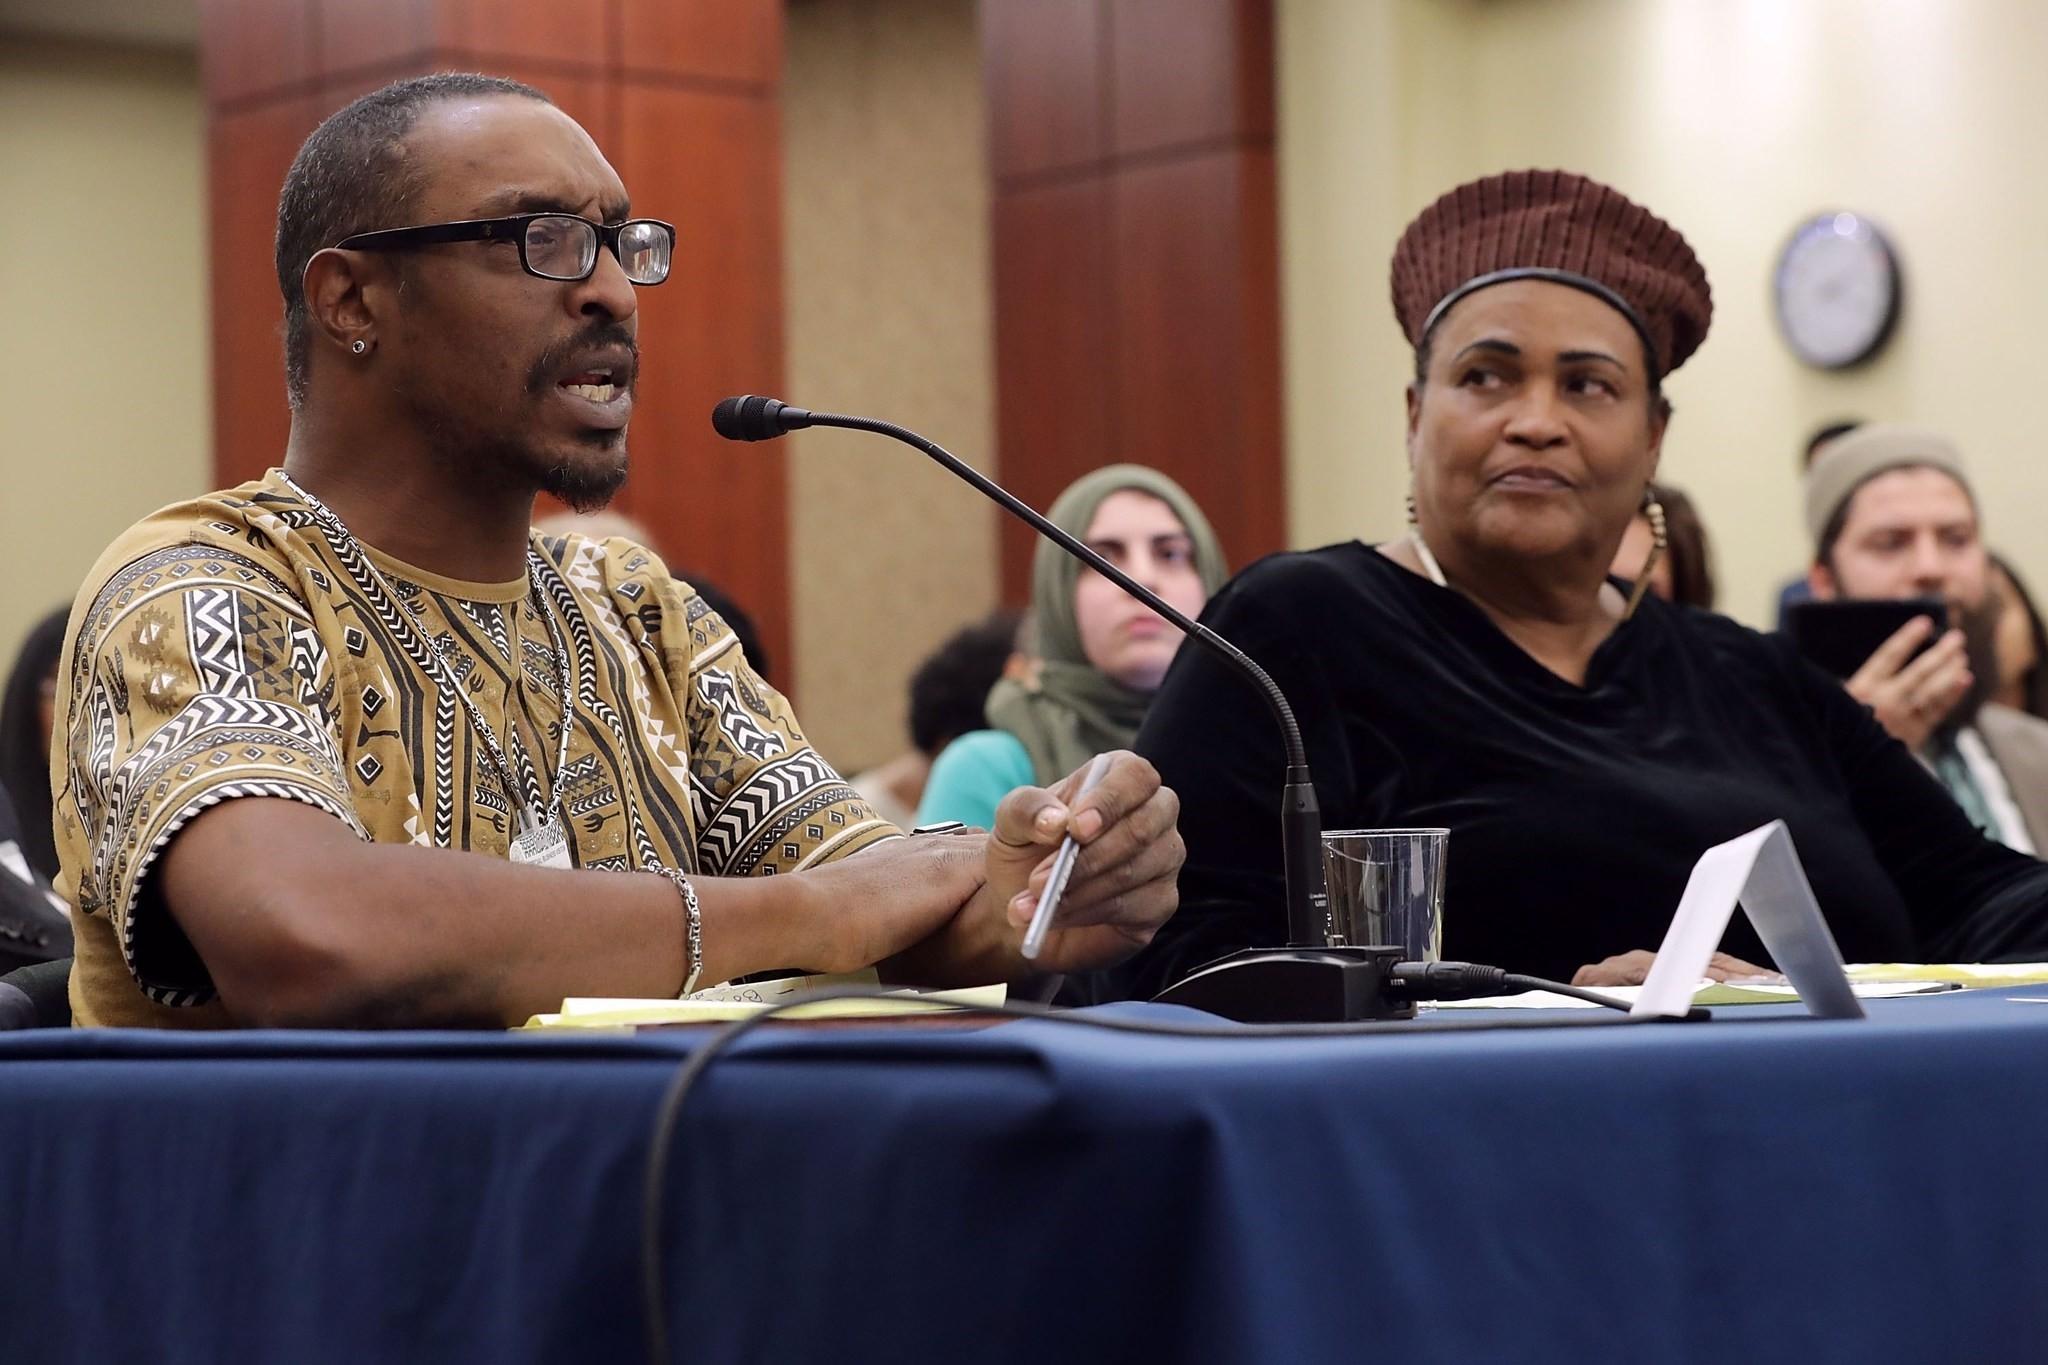 Muhammad Ali Jr and his mother Khalilah Camacho-Ali participate in a forum titled 'Ali v. Trump. (AFP Photo)